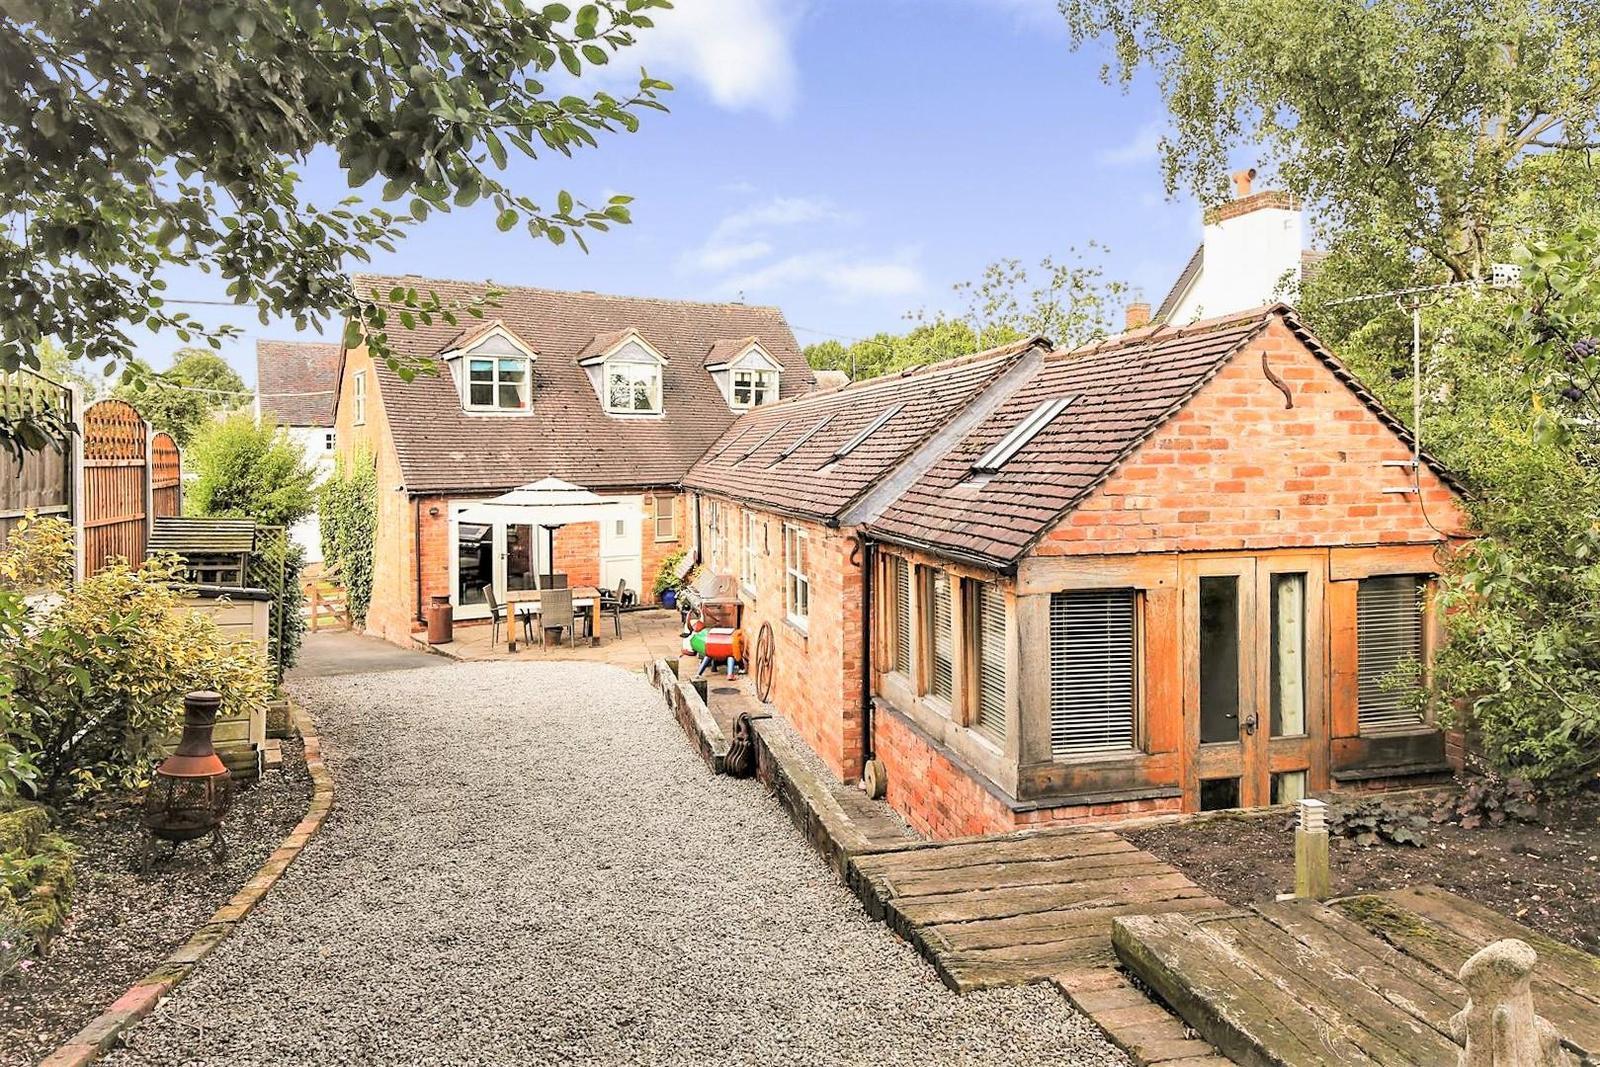 4 Bedrooms Property for sale in Blackhorse Hill, Appleby Magna DE12 7AQ